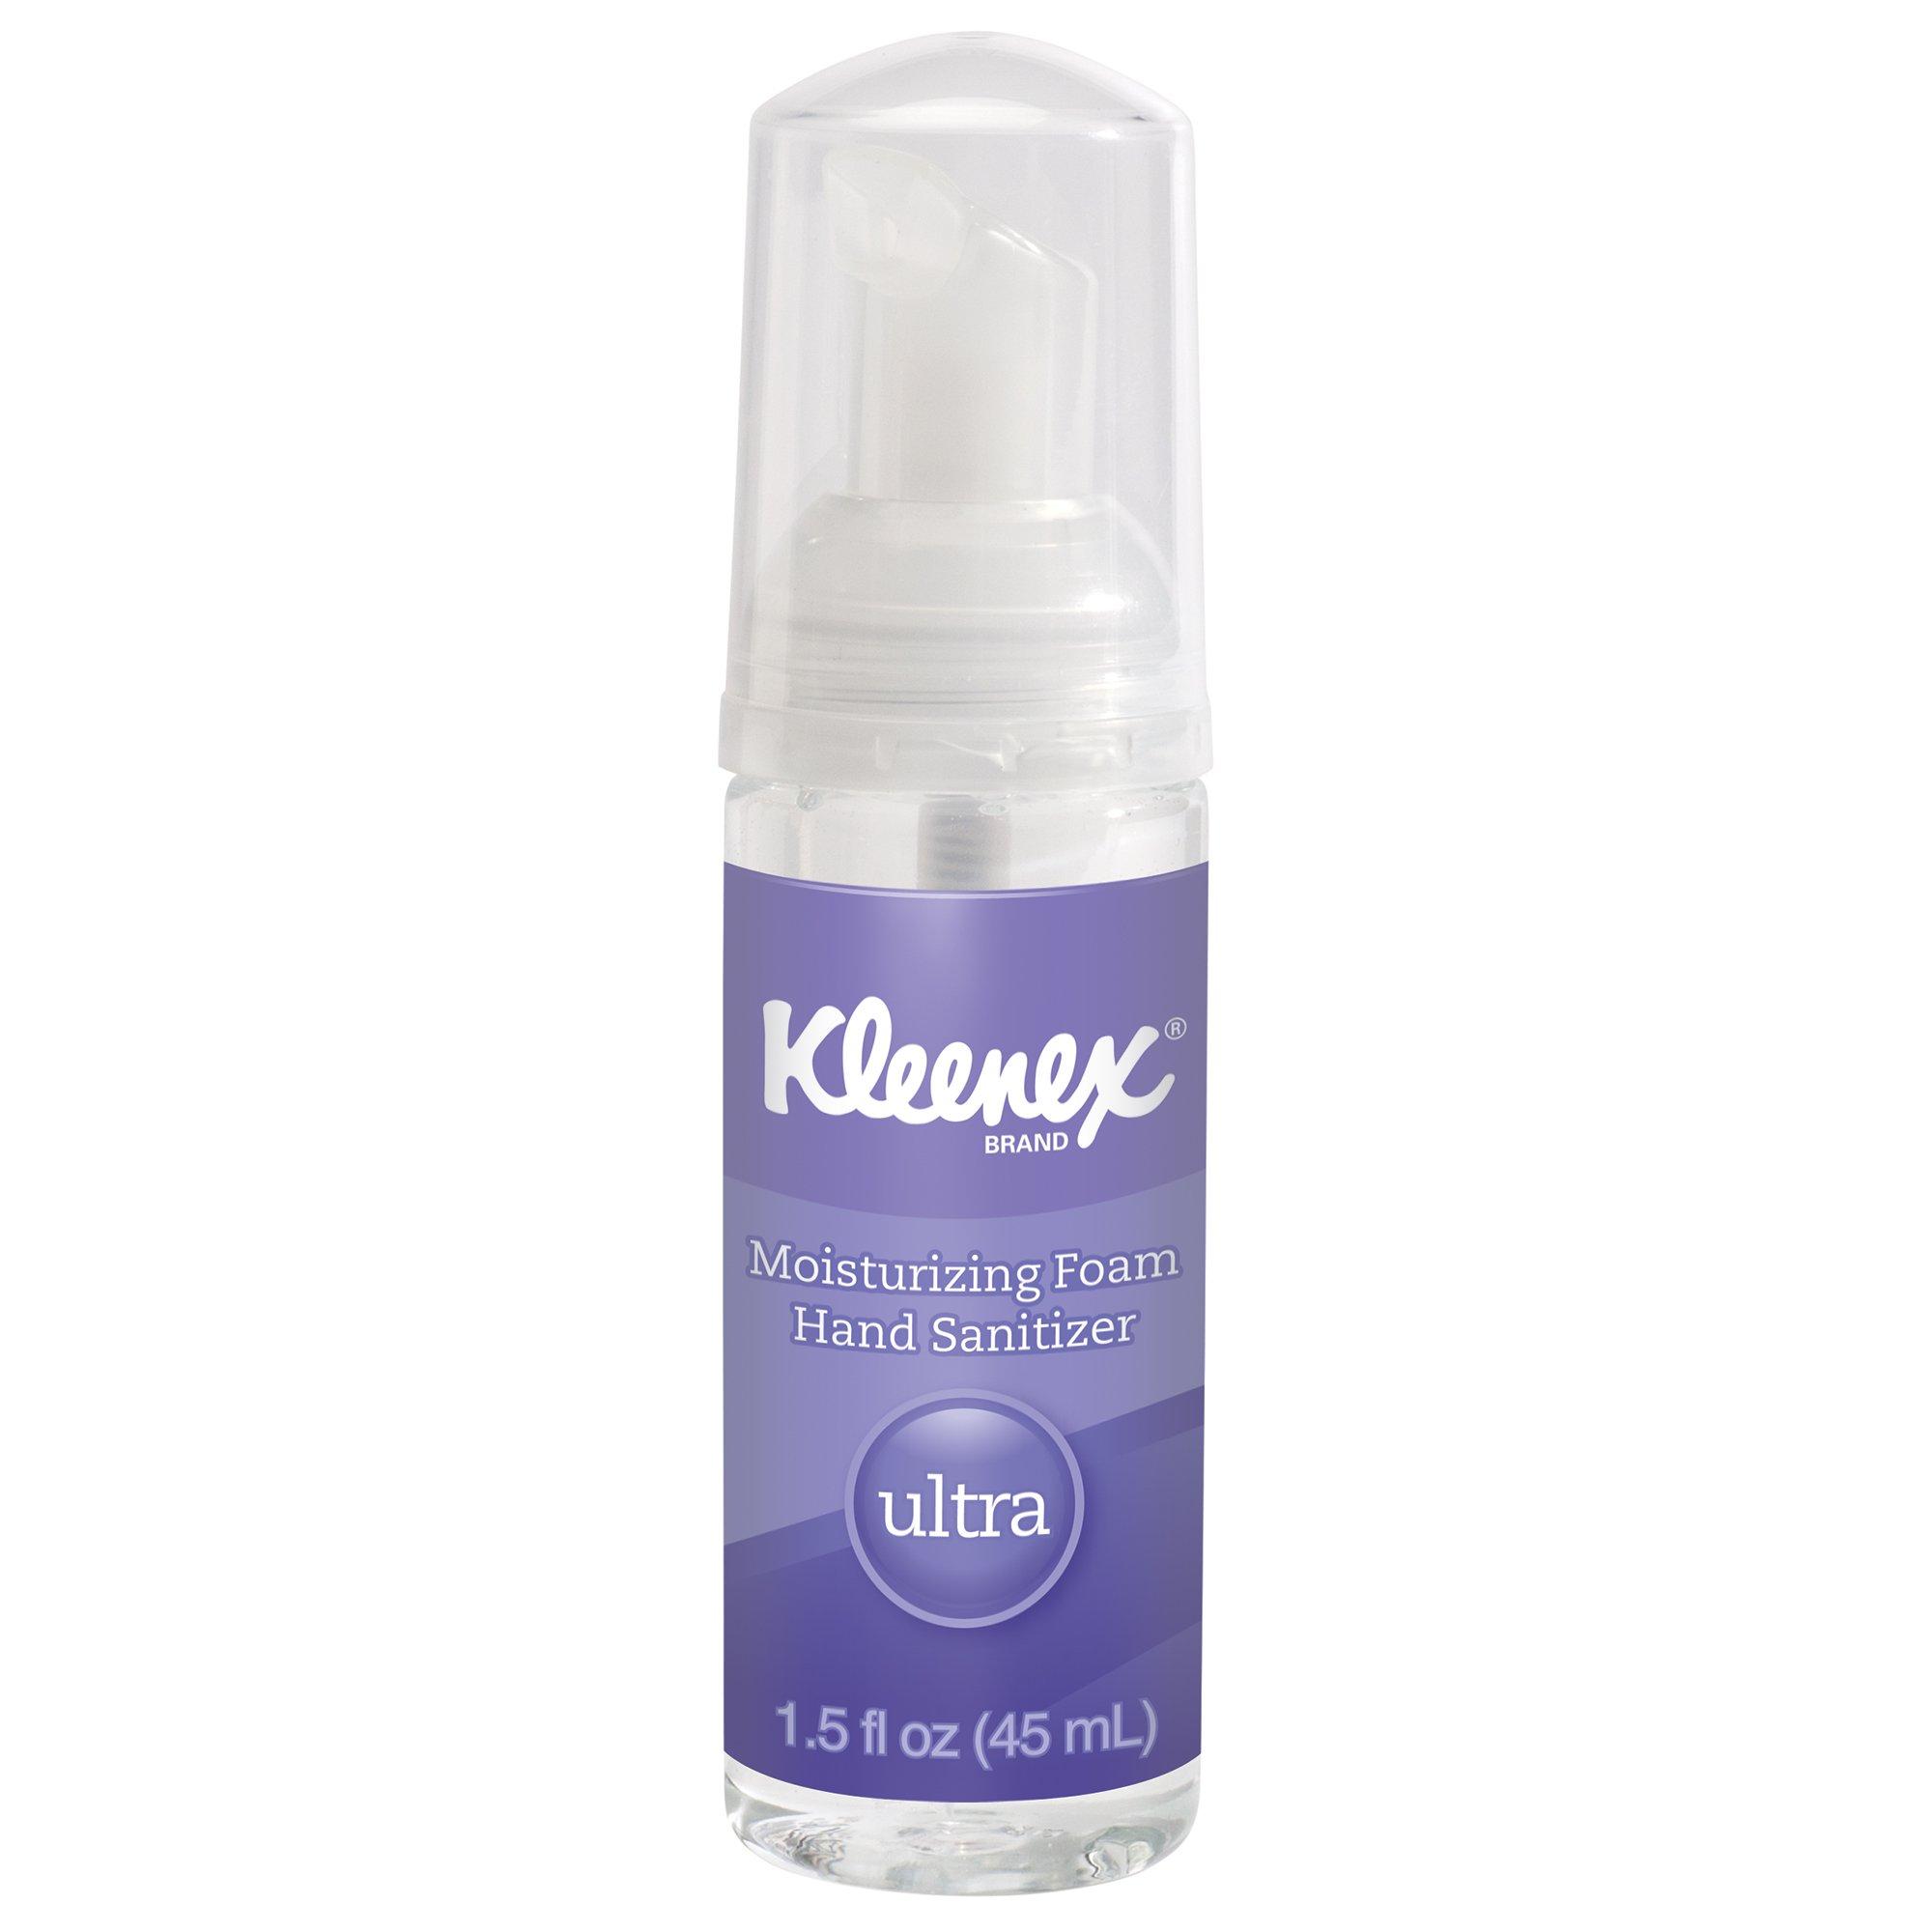 Kleenex Ultra Moisturizing Foam Hand Sanitizer (34604), Clear, 1.5 oz. Pump Bottles, 24 Bottles / Case